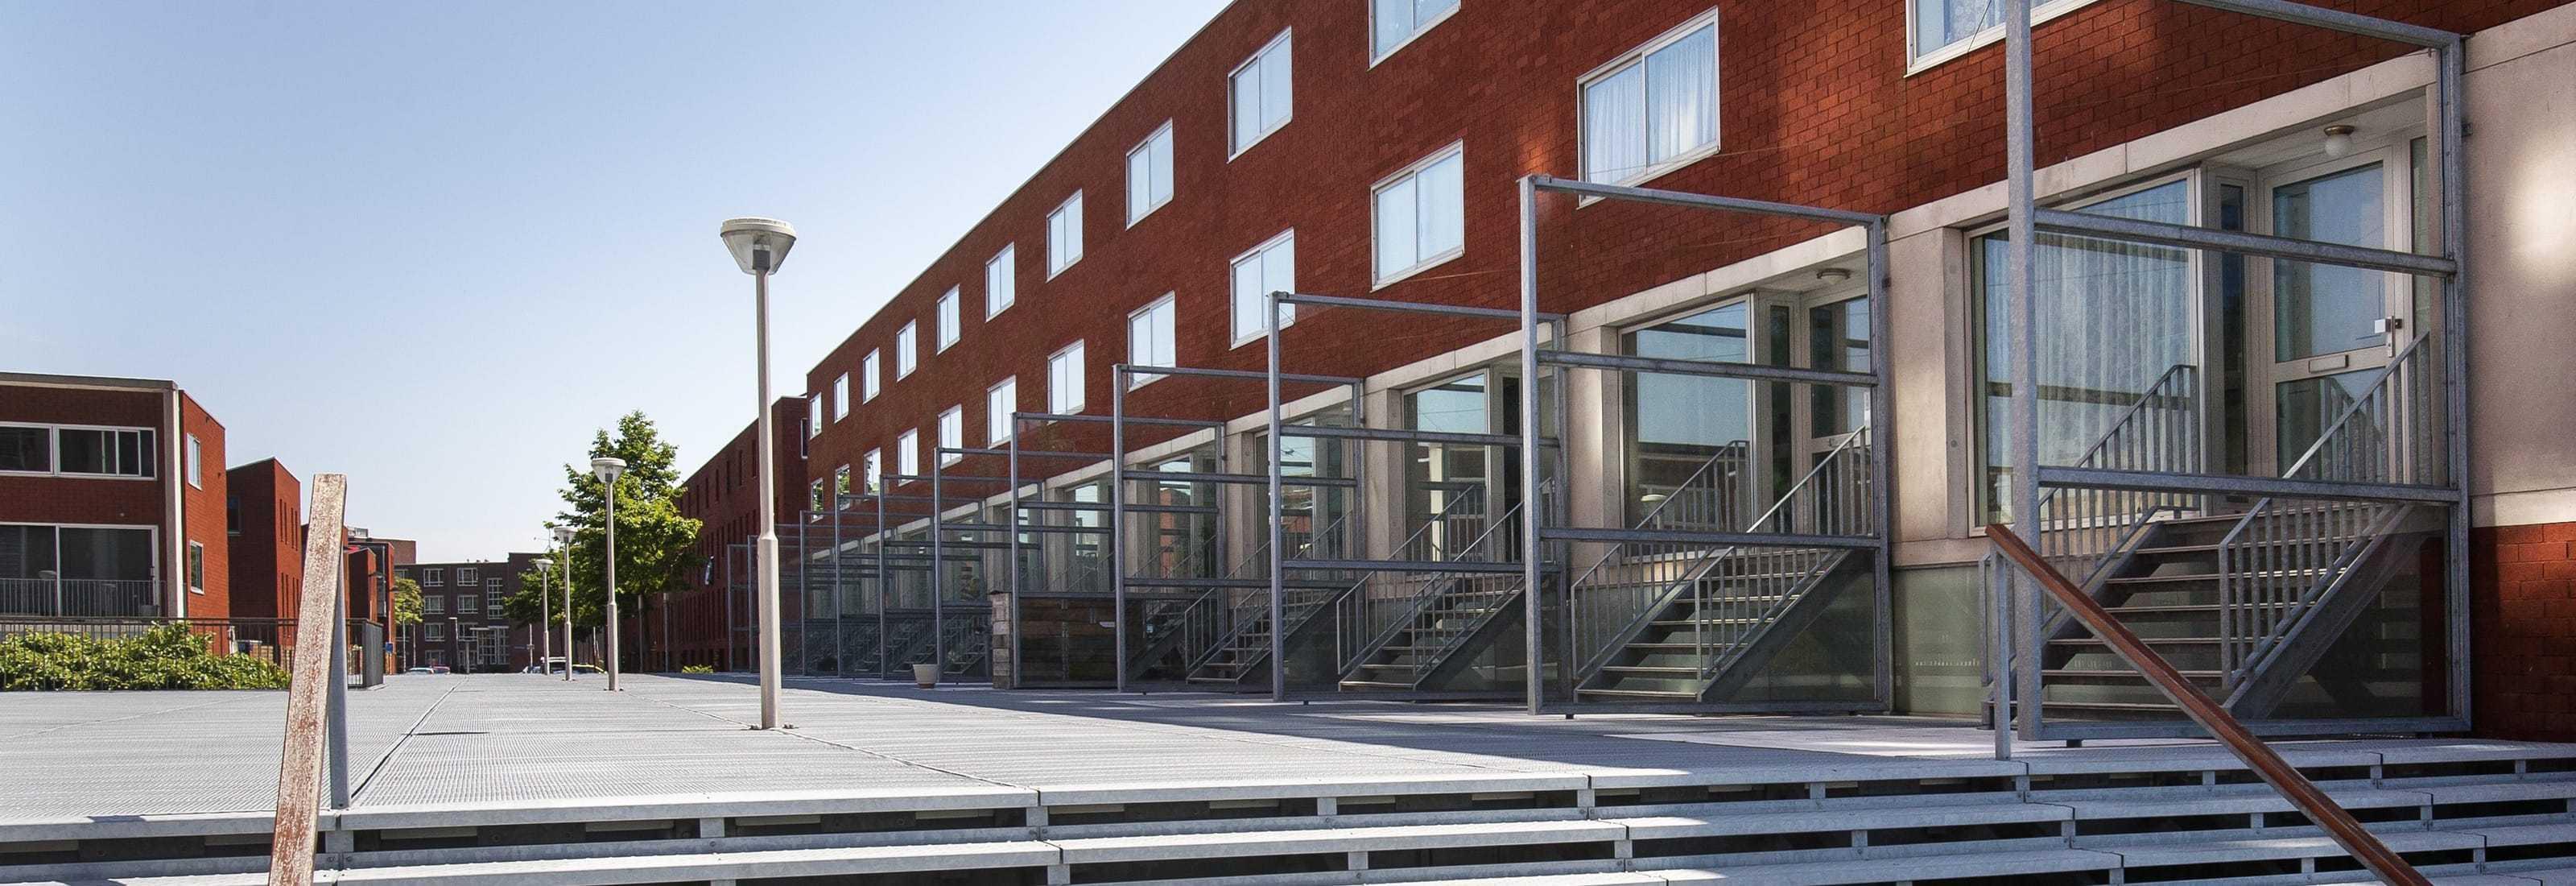 Stairk - Administratiekantoor in Rotterdam